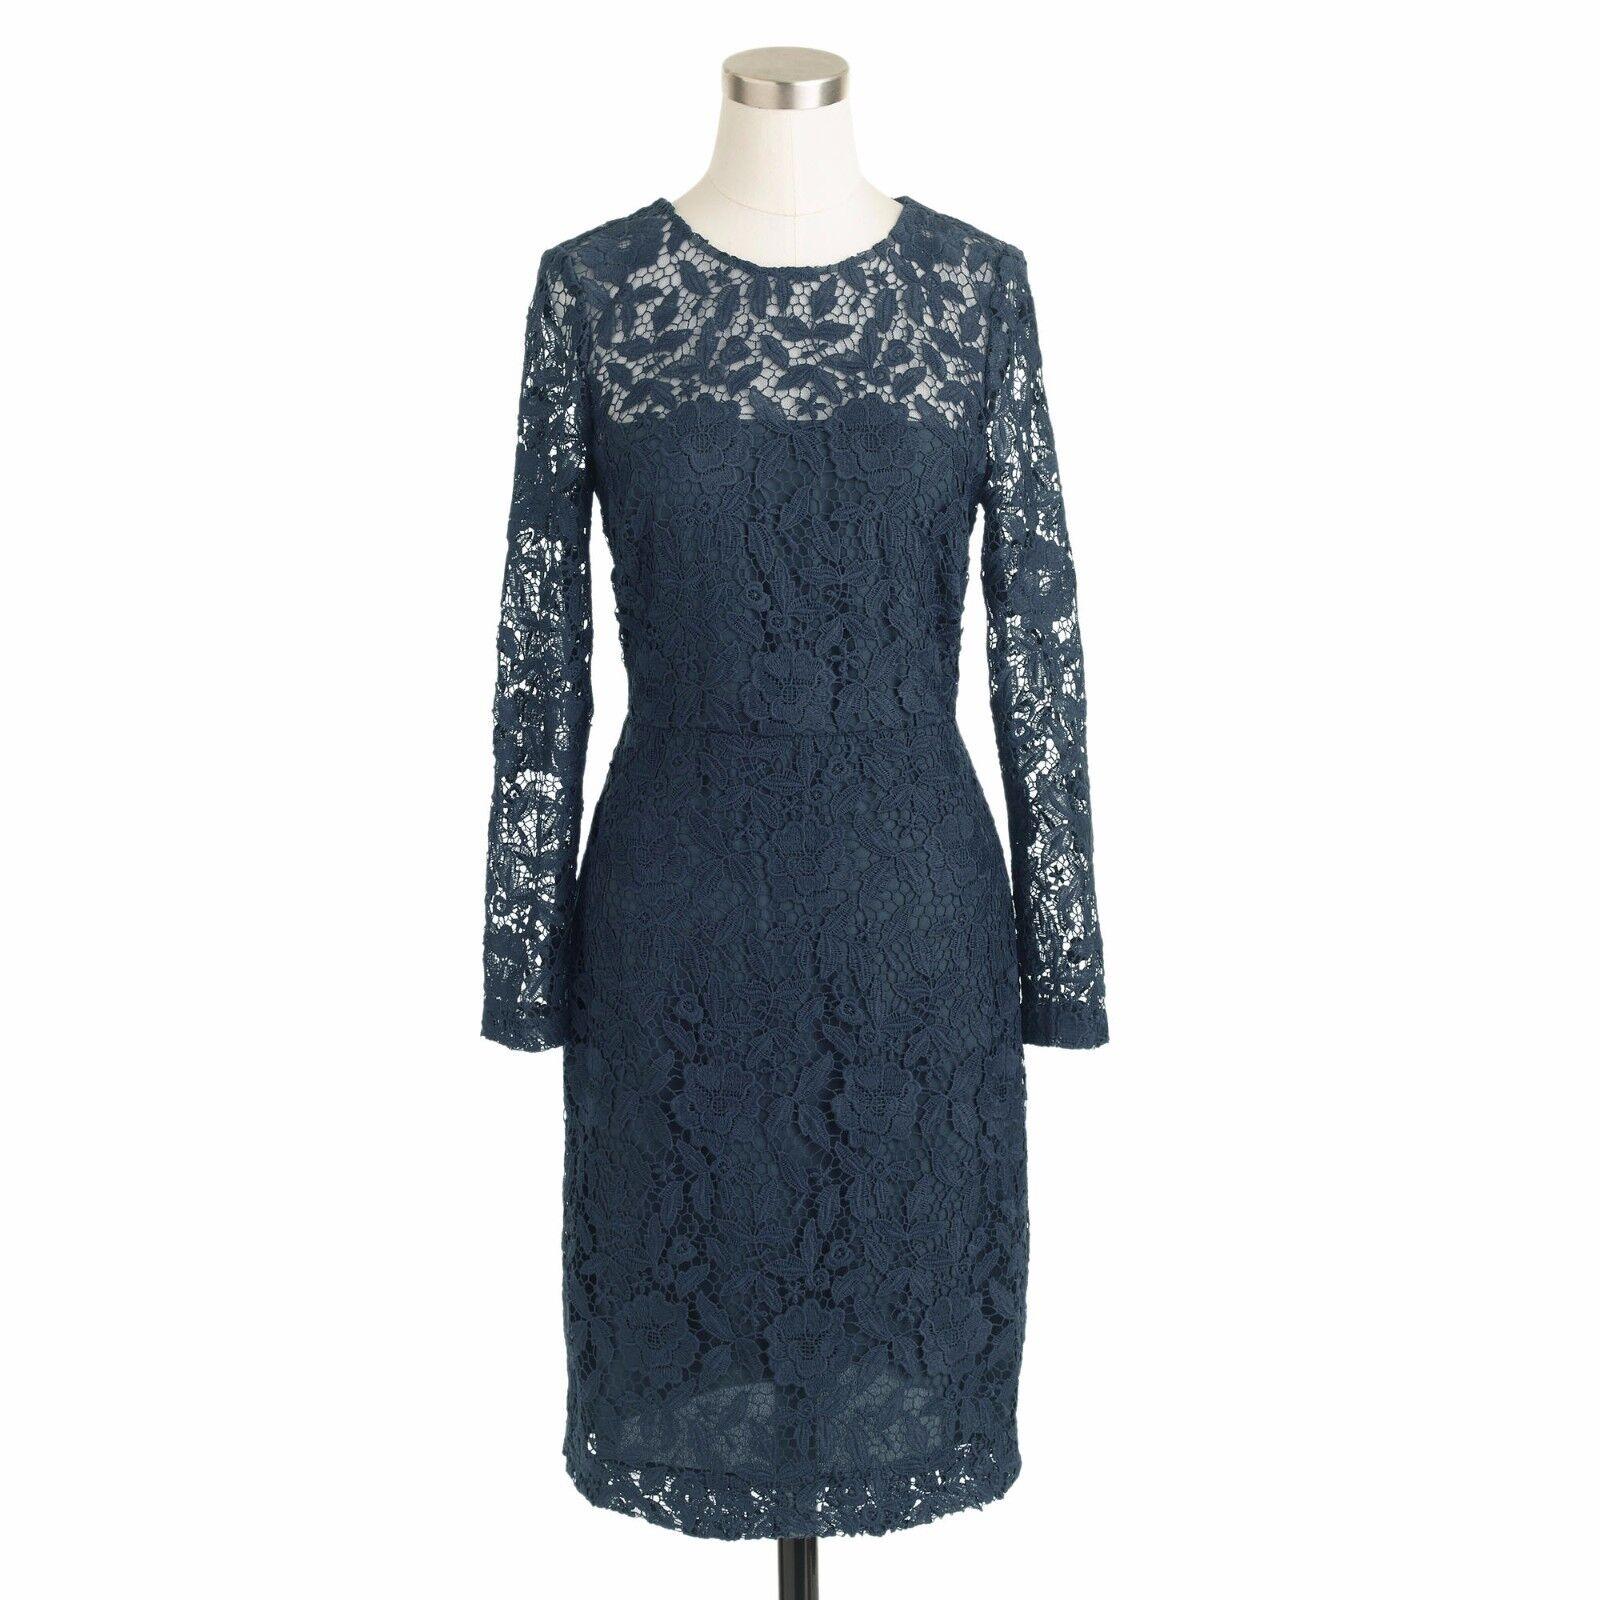 NWT JCREW FLORAL LACE SHIFT DRESS 0 XS DARK GRAVEL